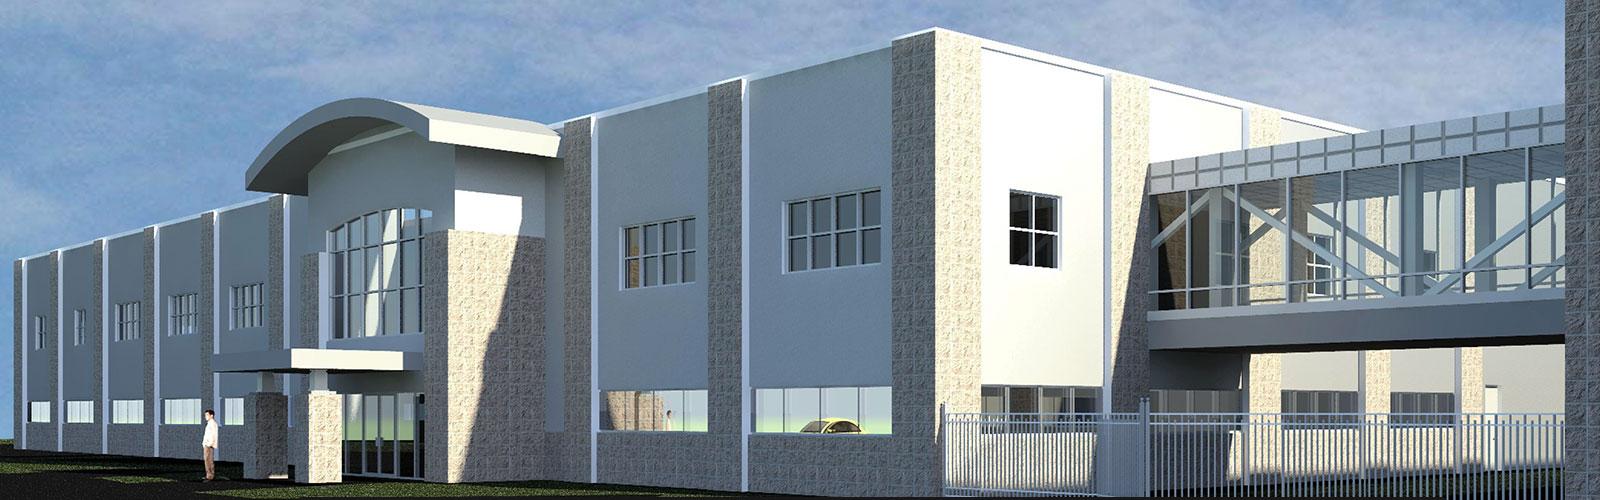 SoundOff Signal - new building